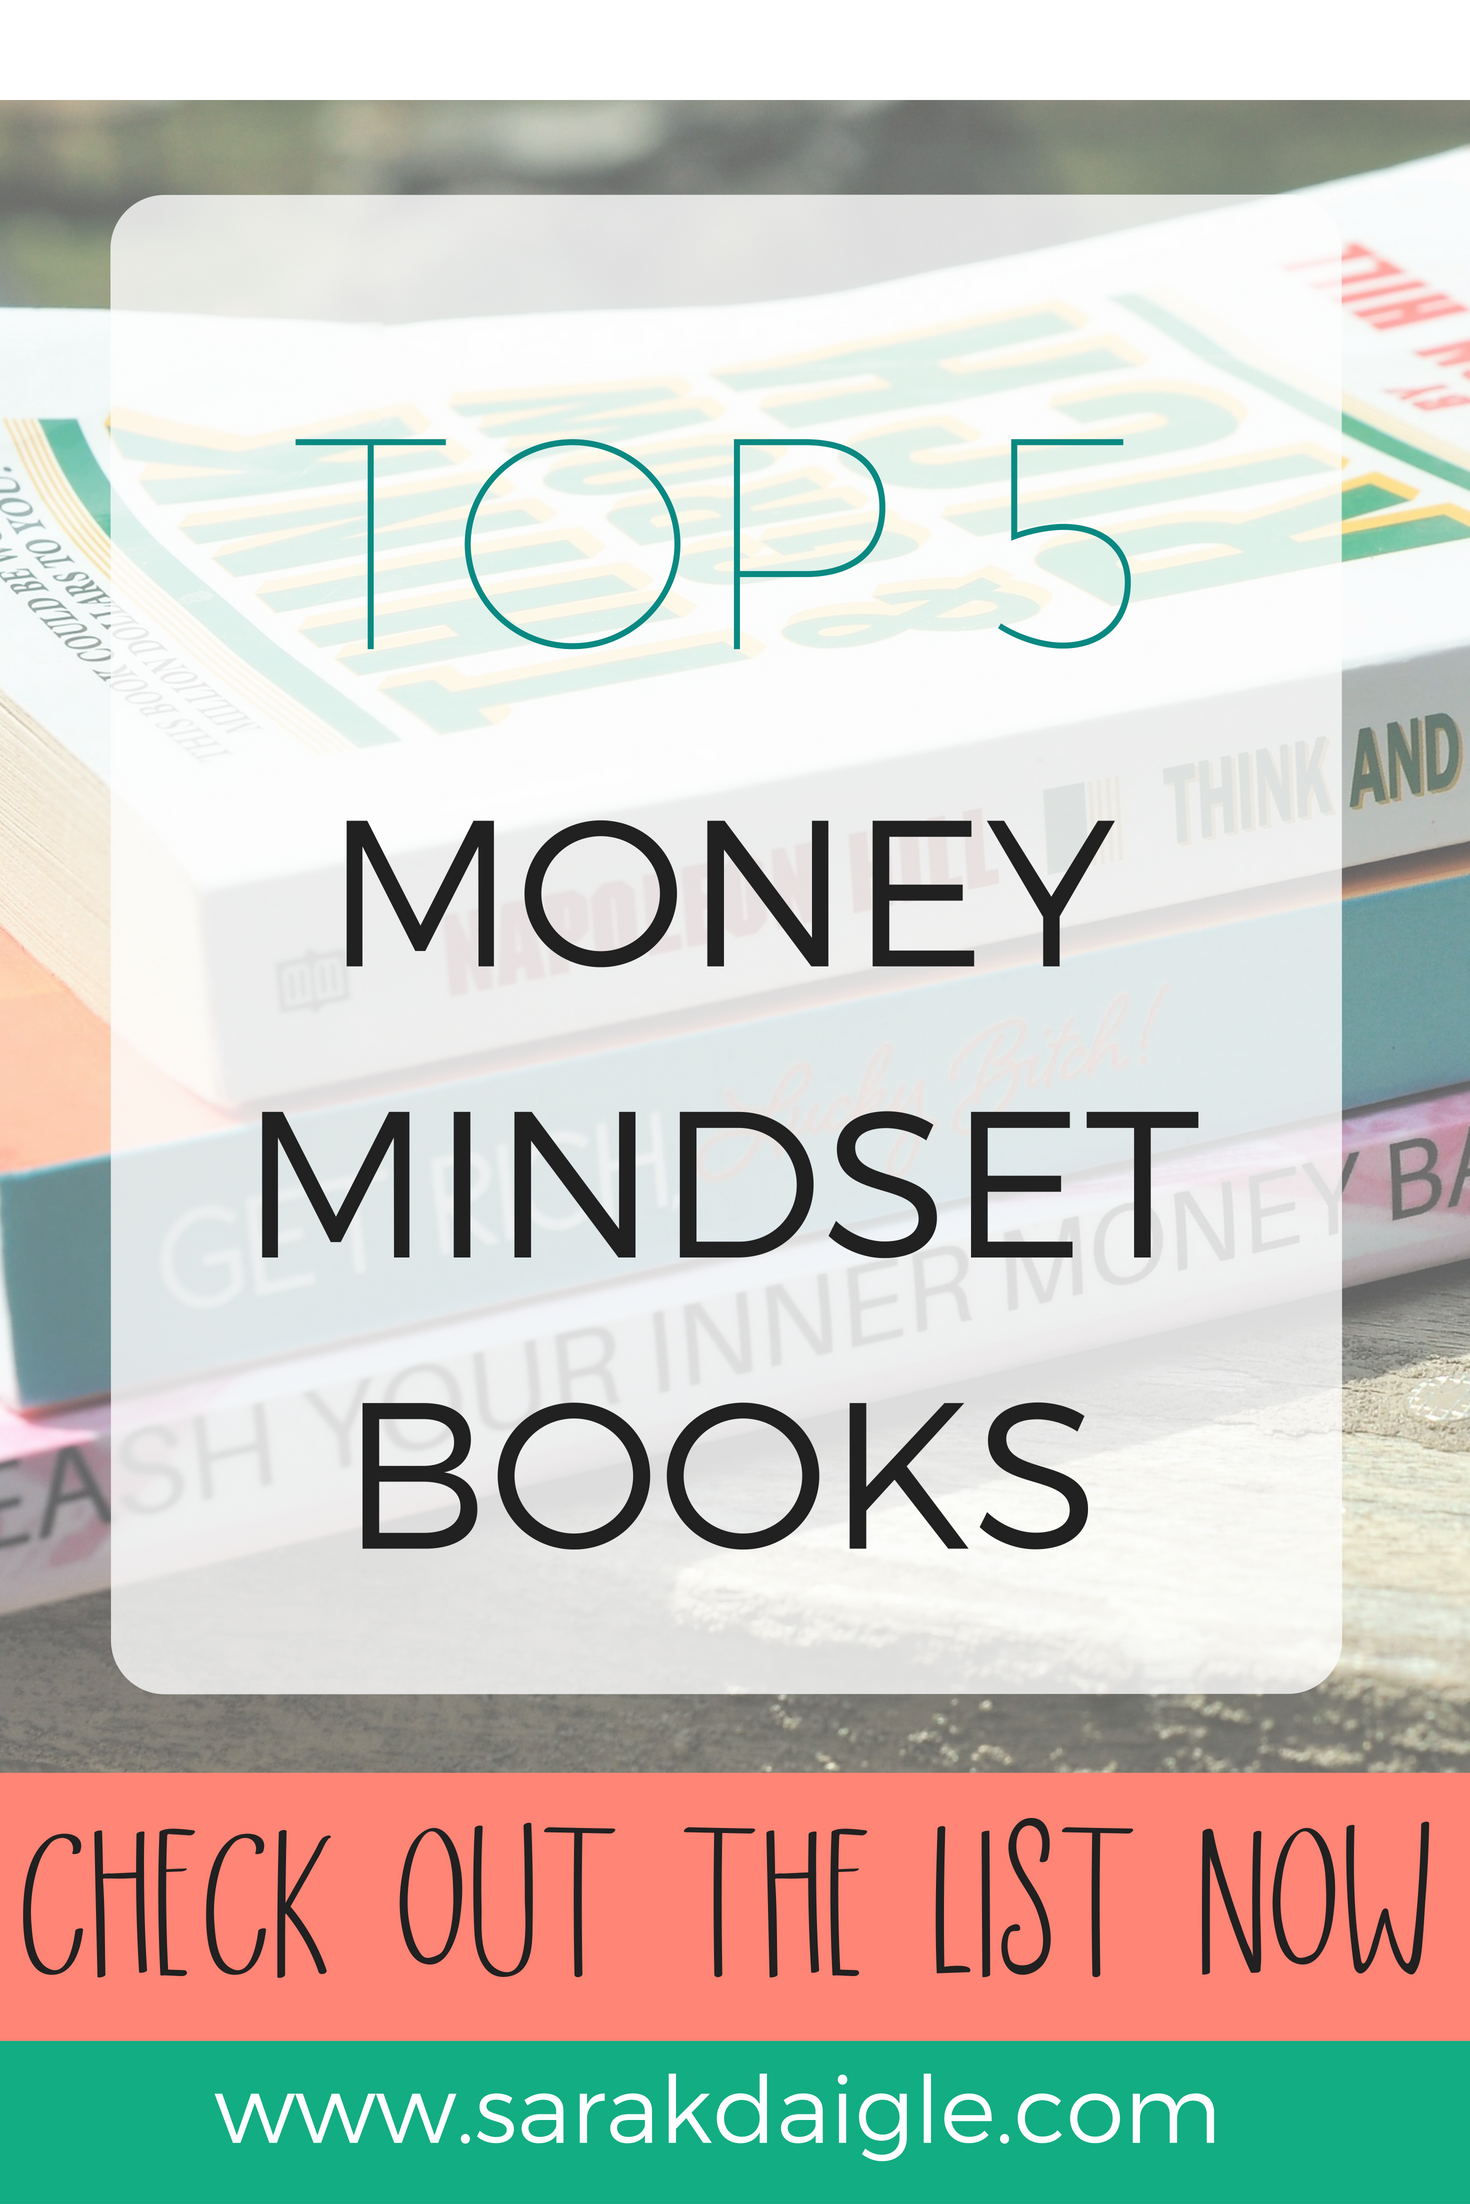 Top 5 Money Mindset Books